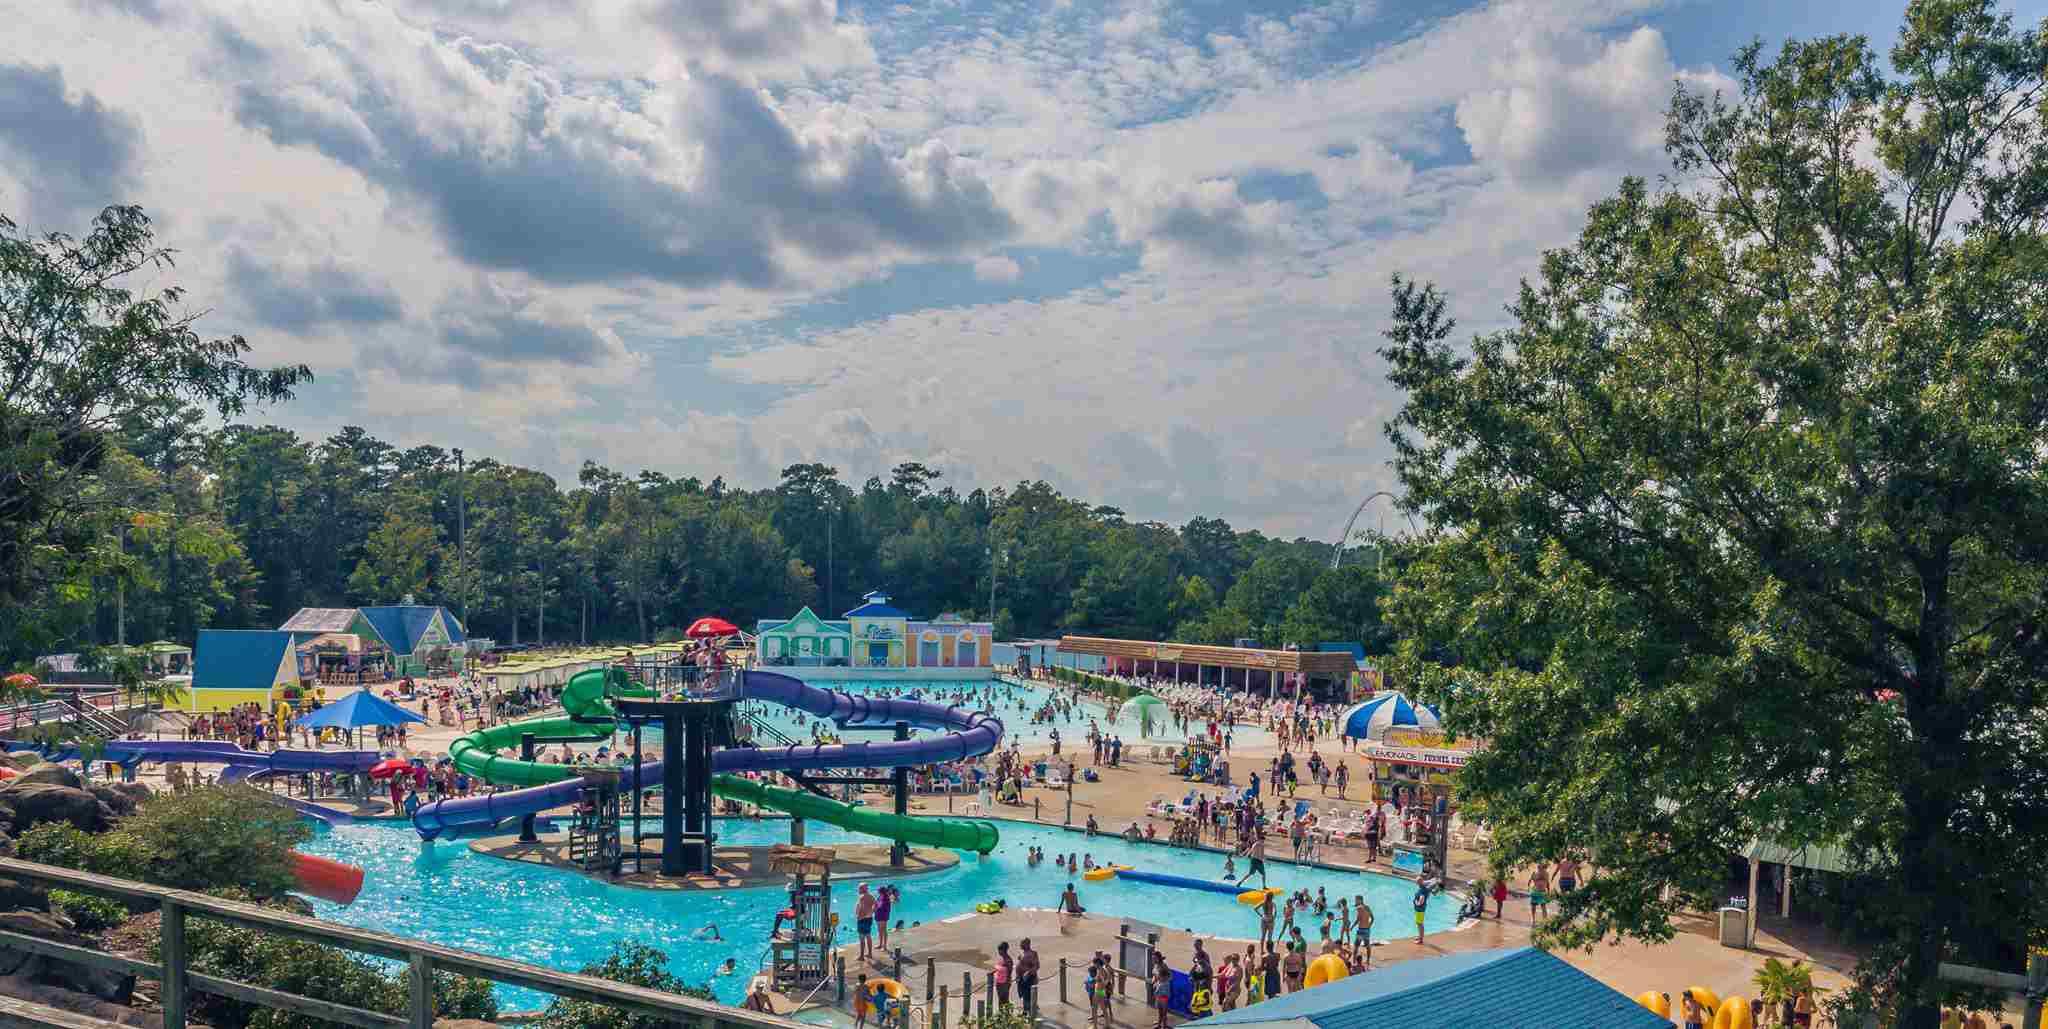 aerial shot of slides and pools at Ocean Breeze Waterpark